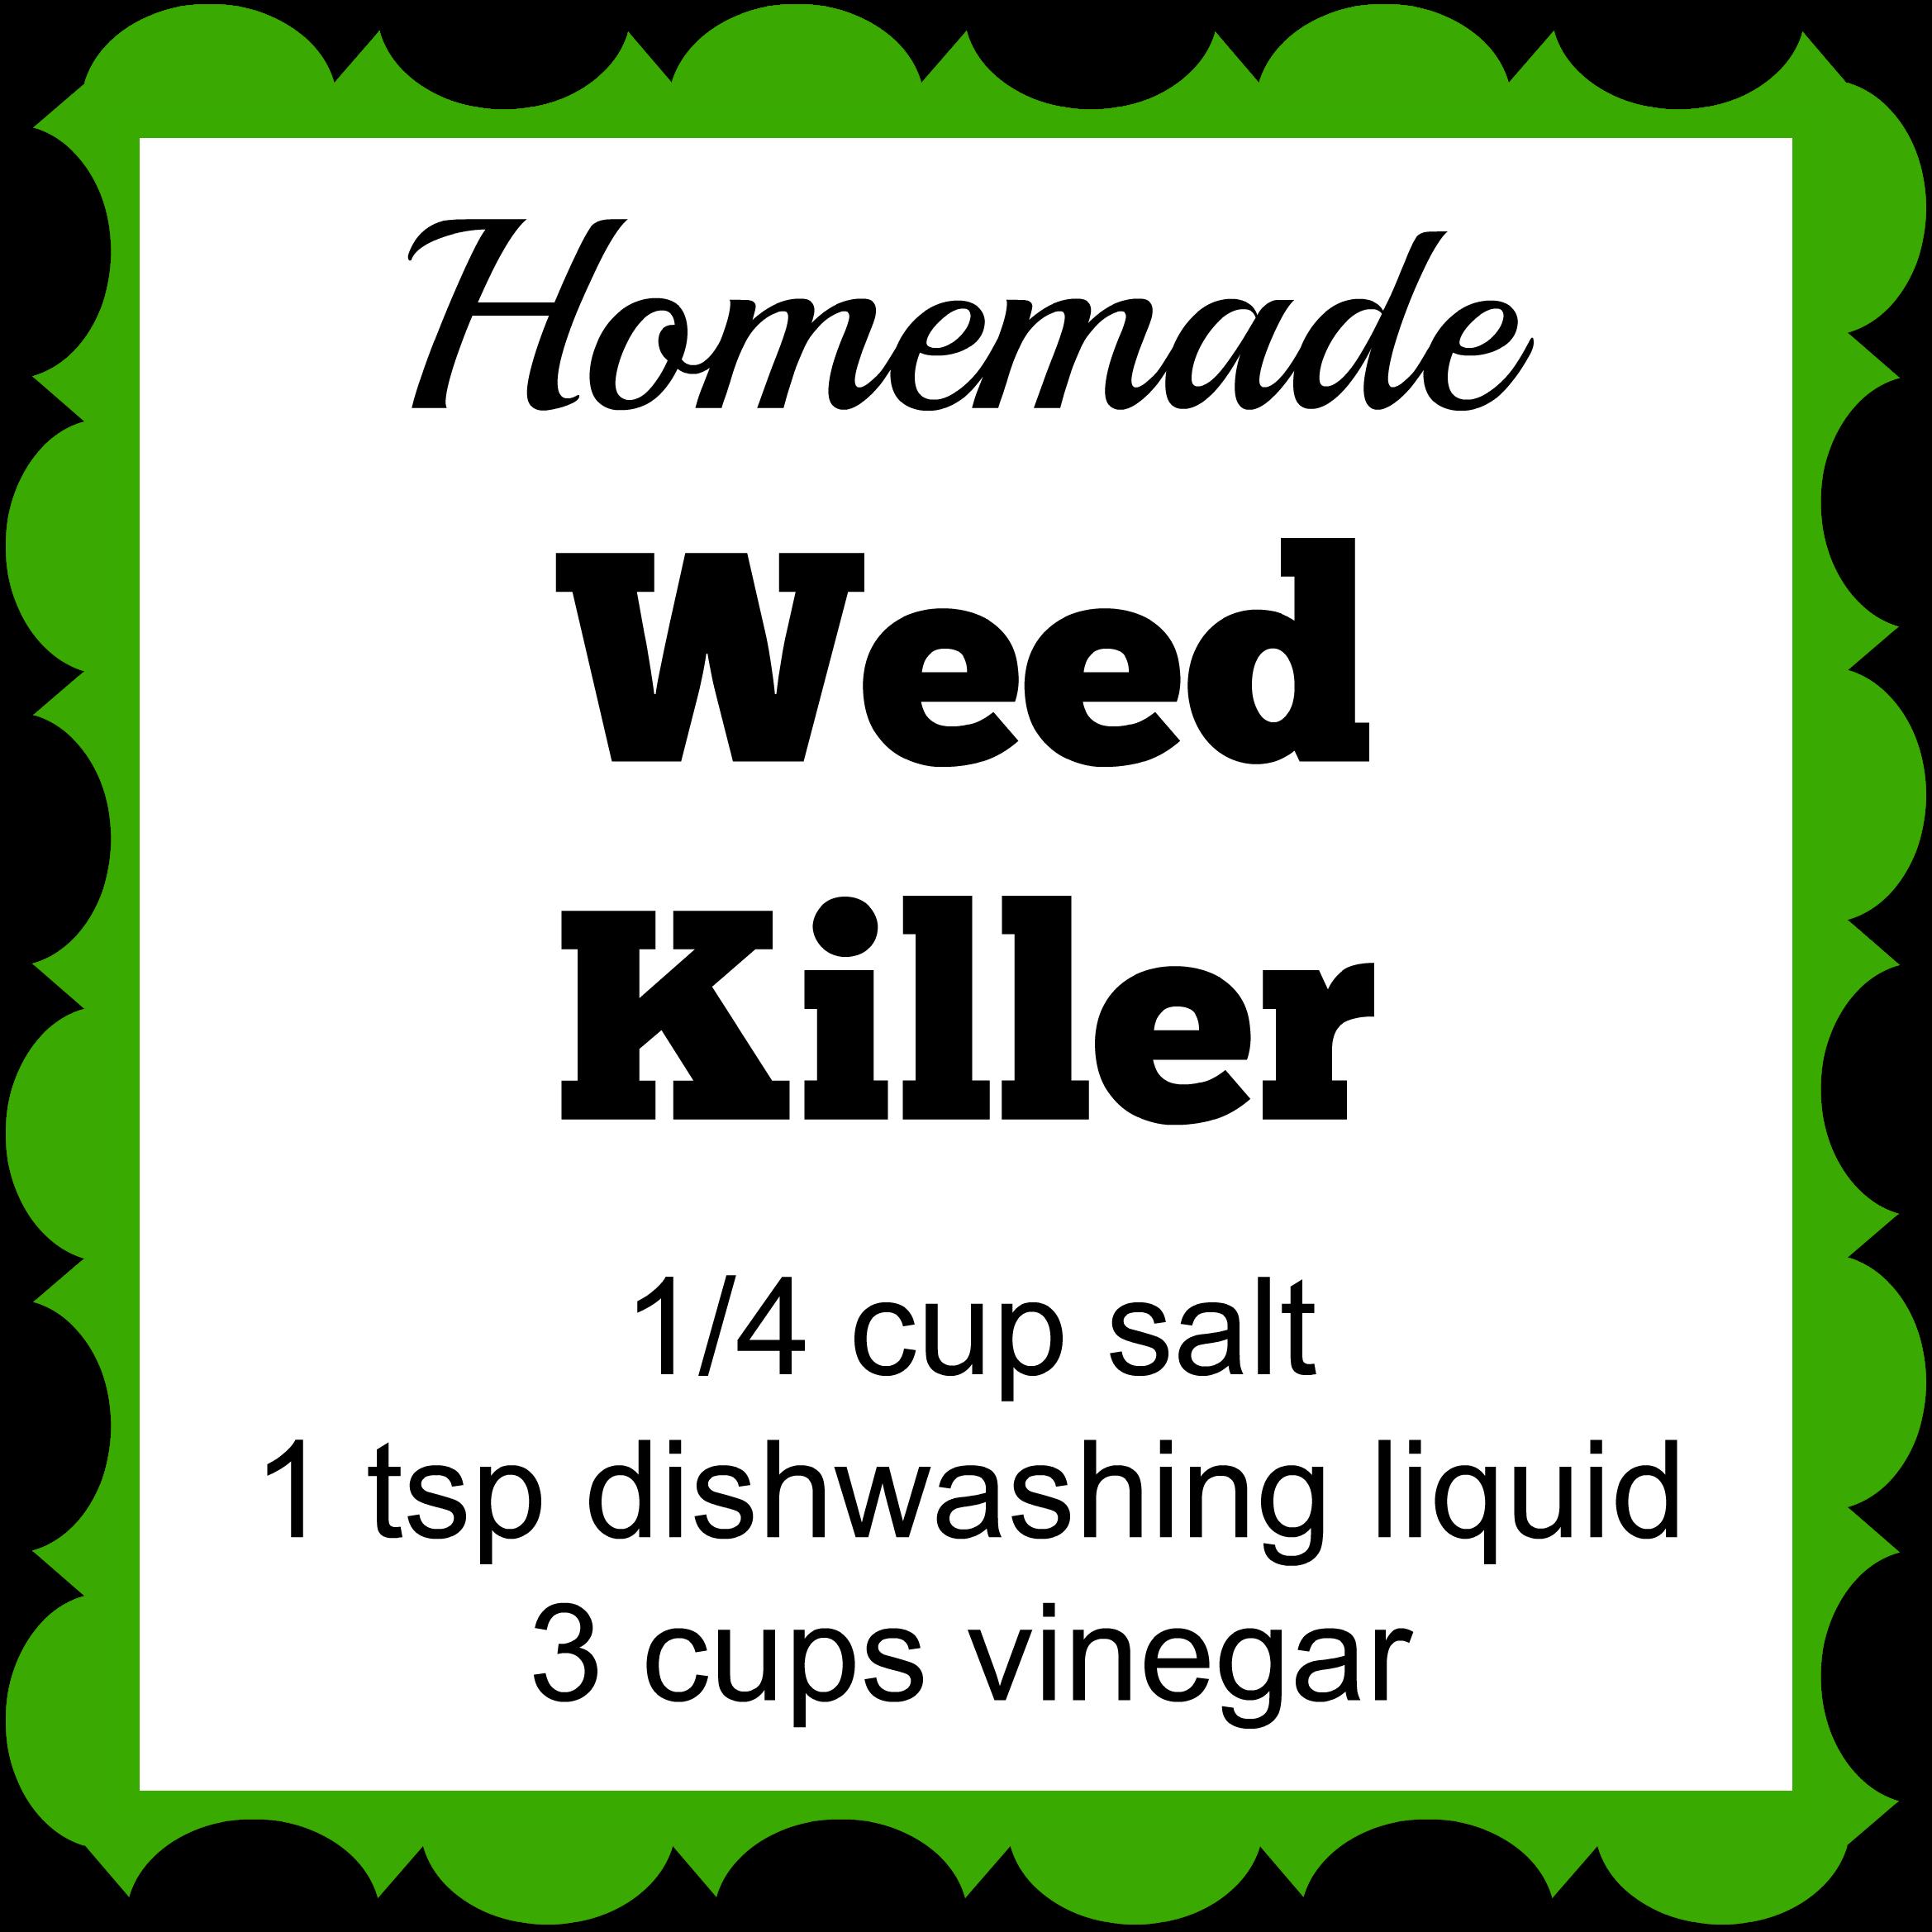 Weeds in flower beds organic killer - Homemade Weed Killer